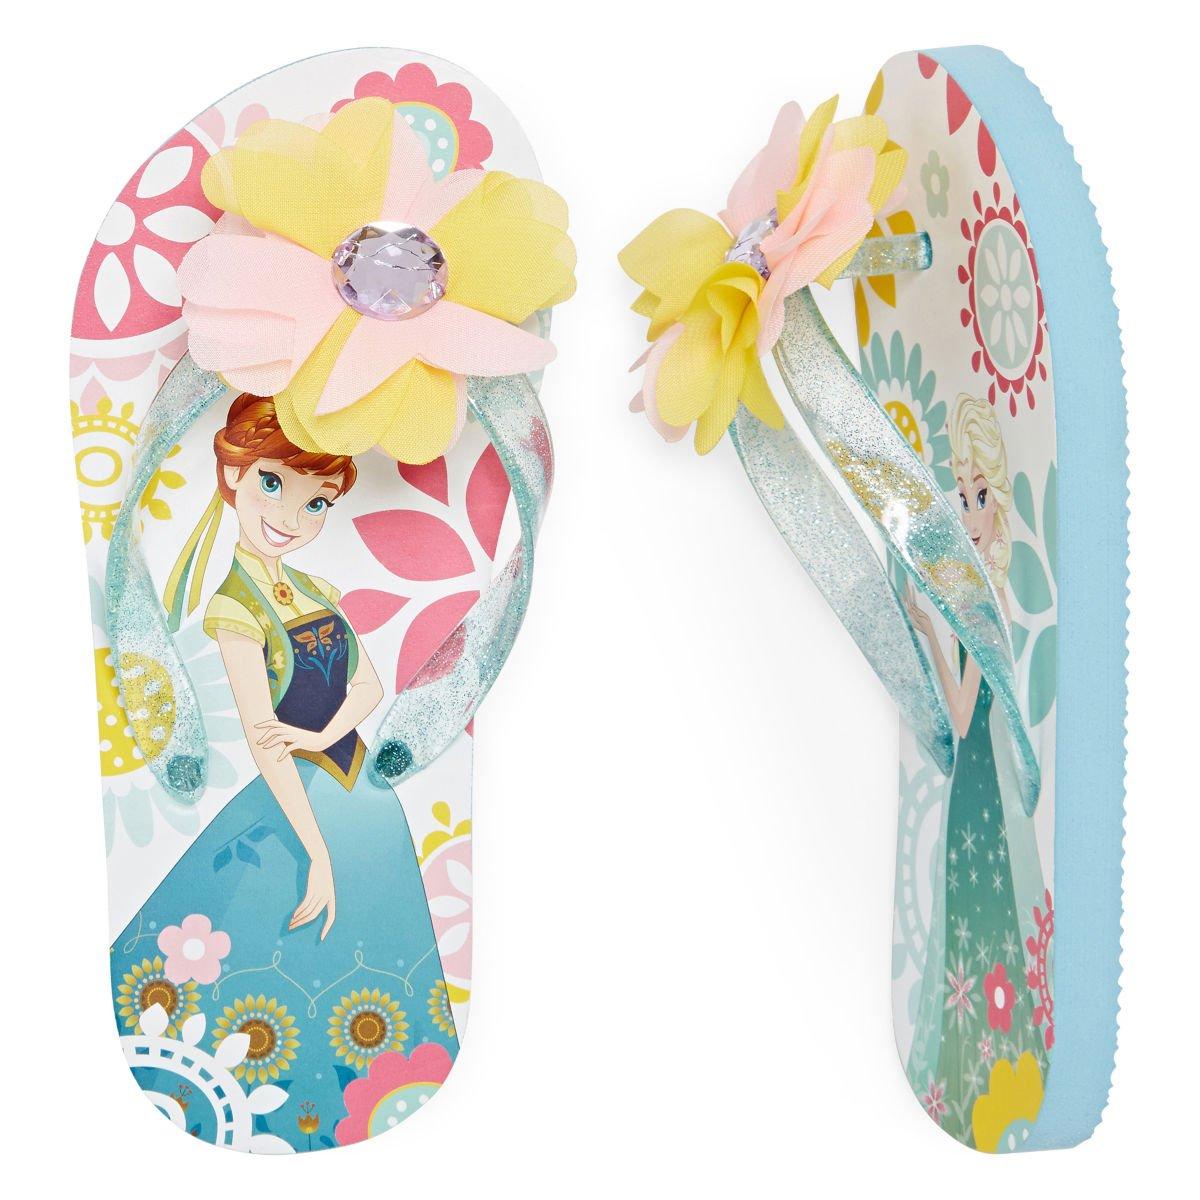 Disney Frozen Anna and Elsa Flip-Flop Sandals and Sunglasses